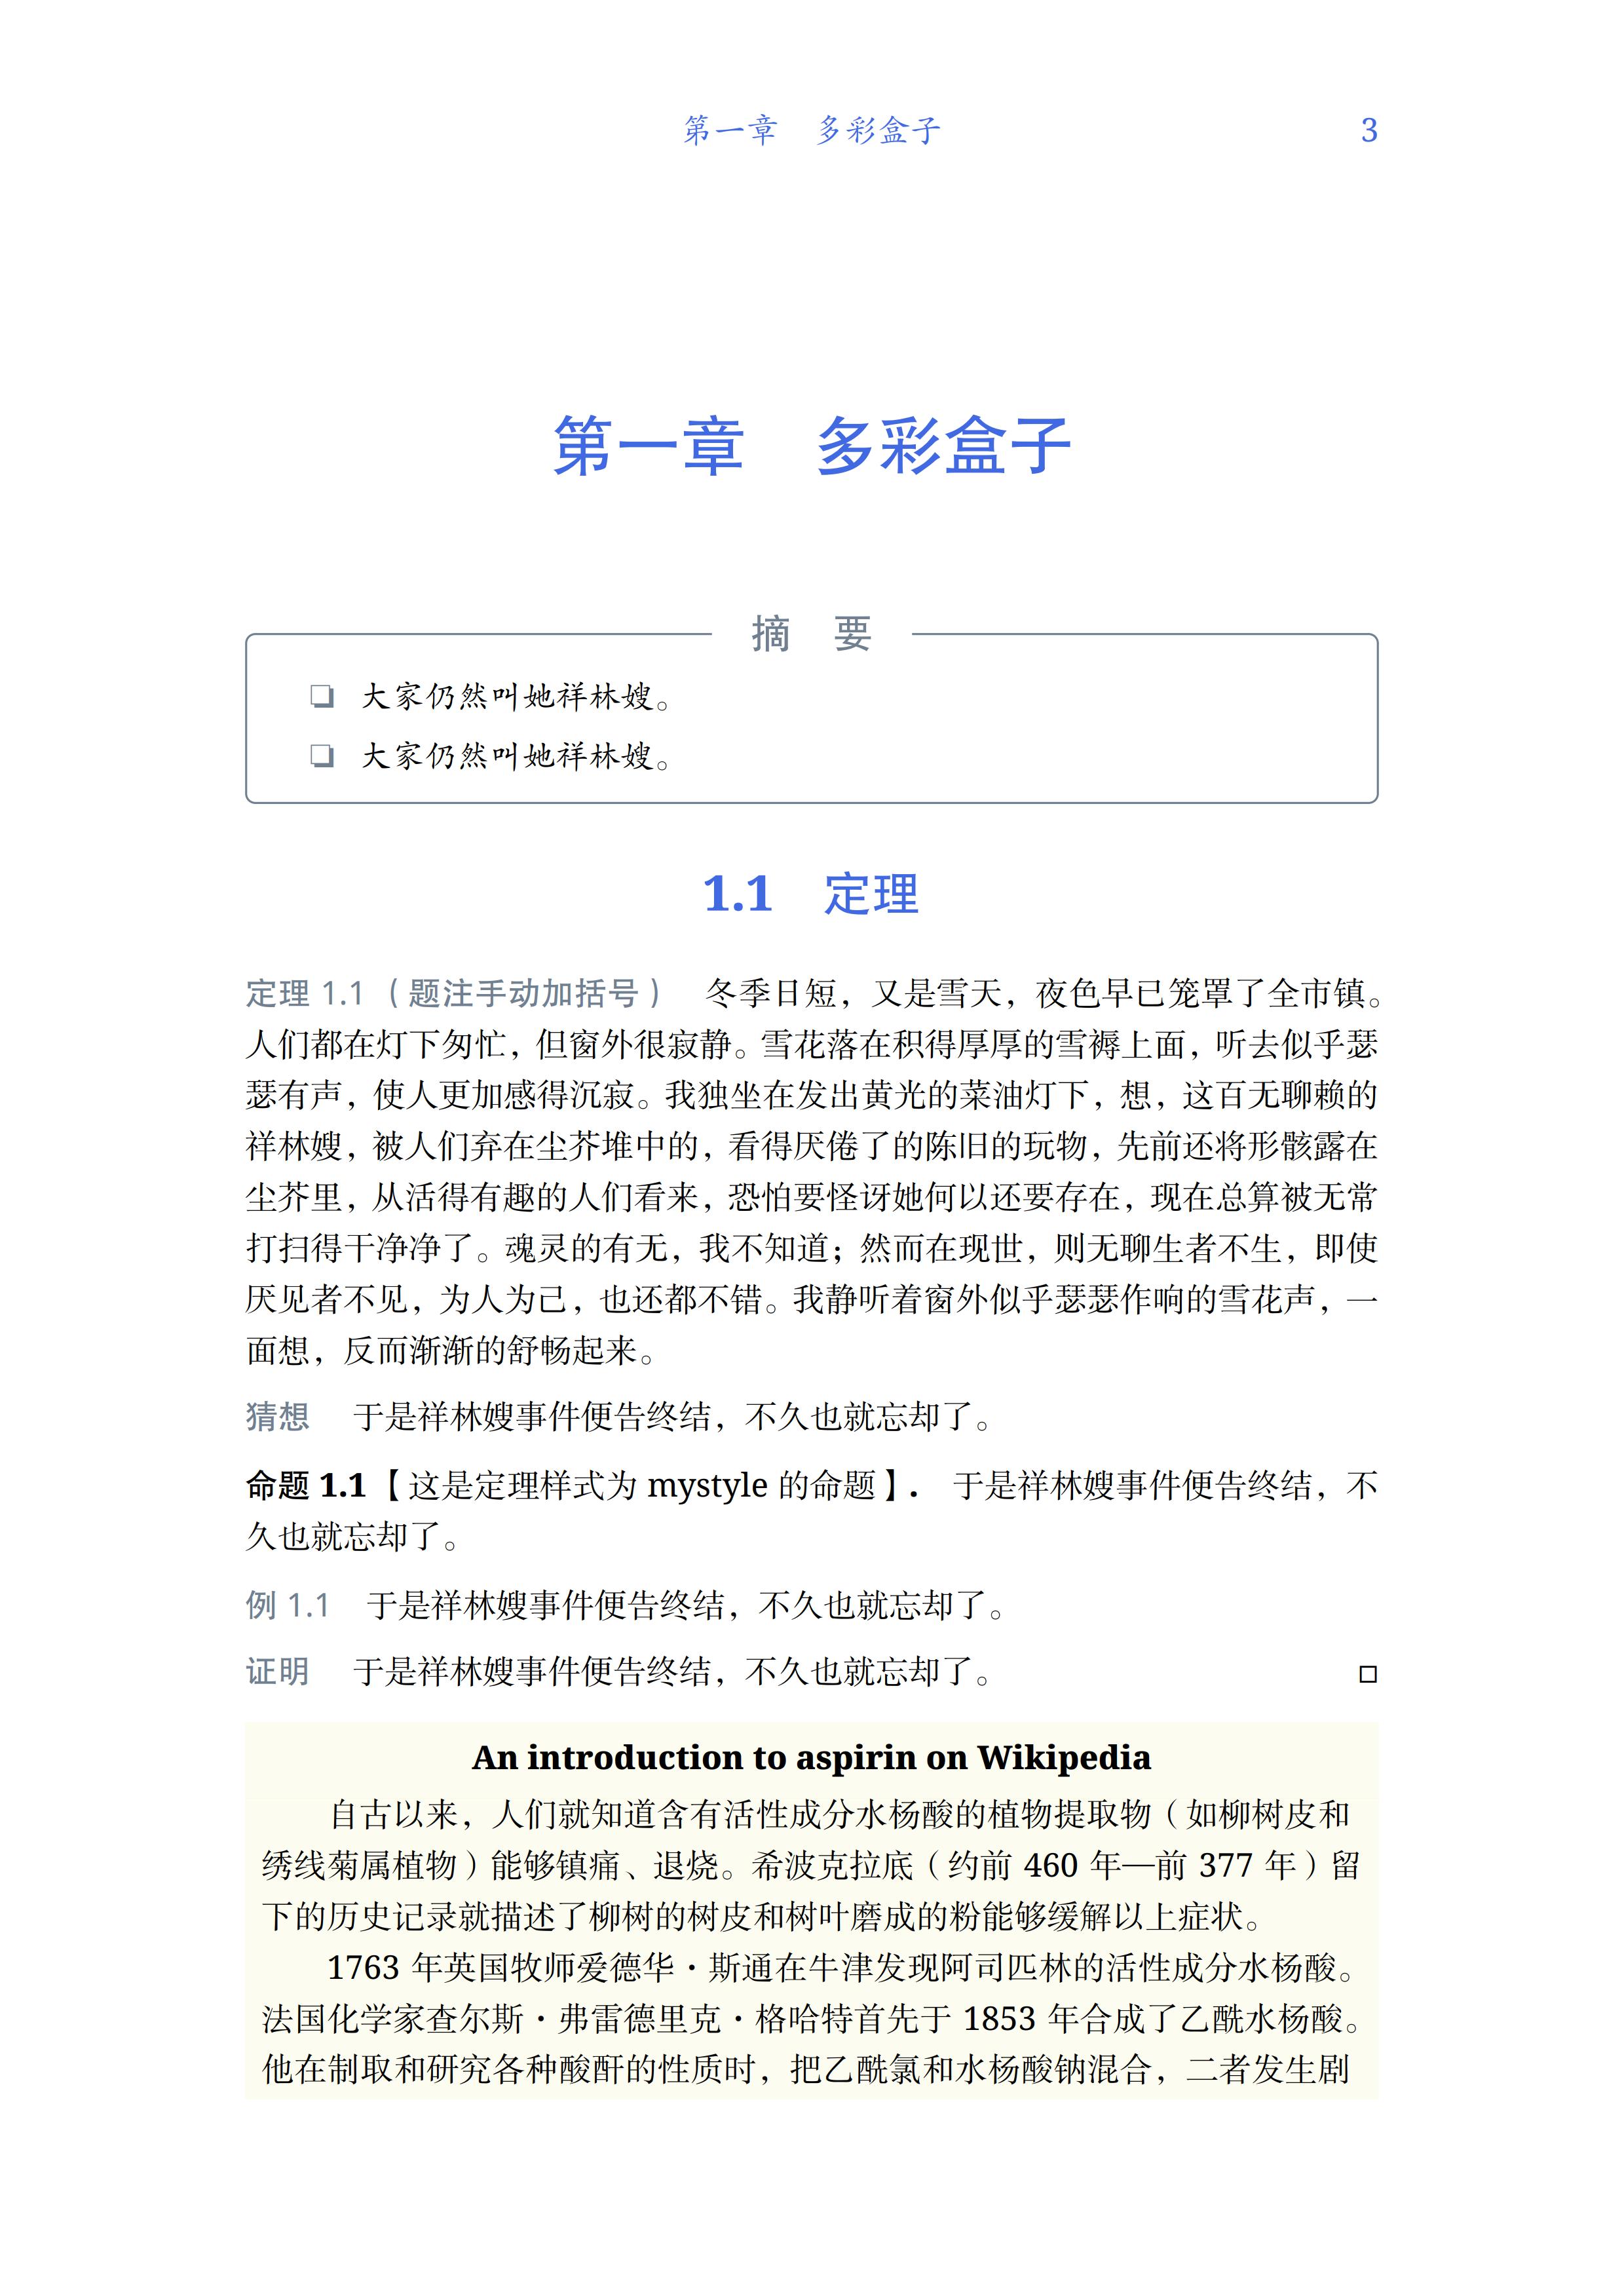 easybook 文档类 v1.26